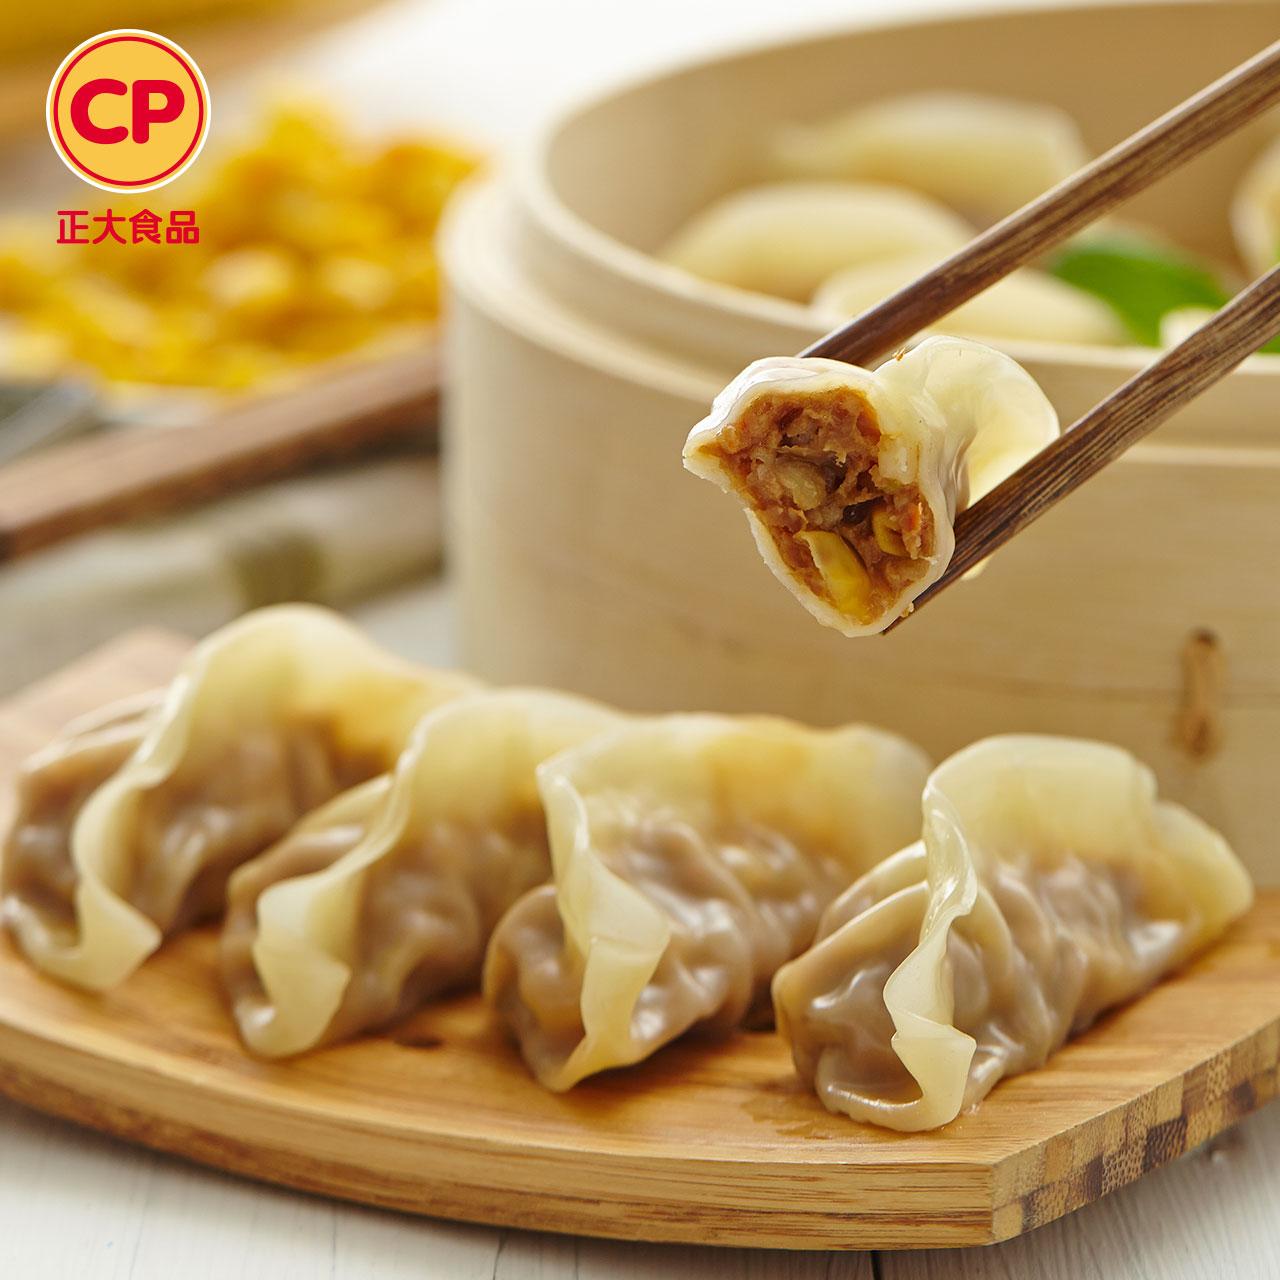 CP 正大食品 菌菇三鲜蒸饺 460g*4袋 天猫优惠券折后¥59.9包邮(¥99.9-40)